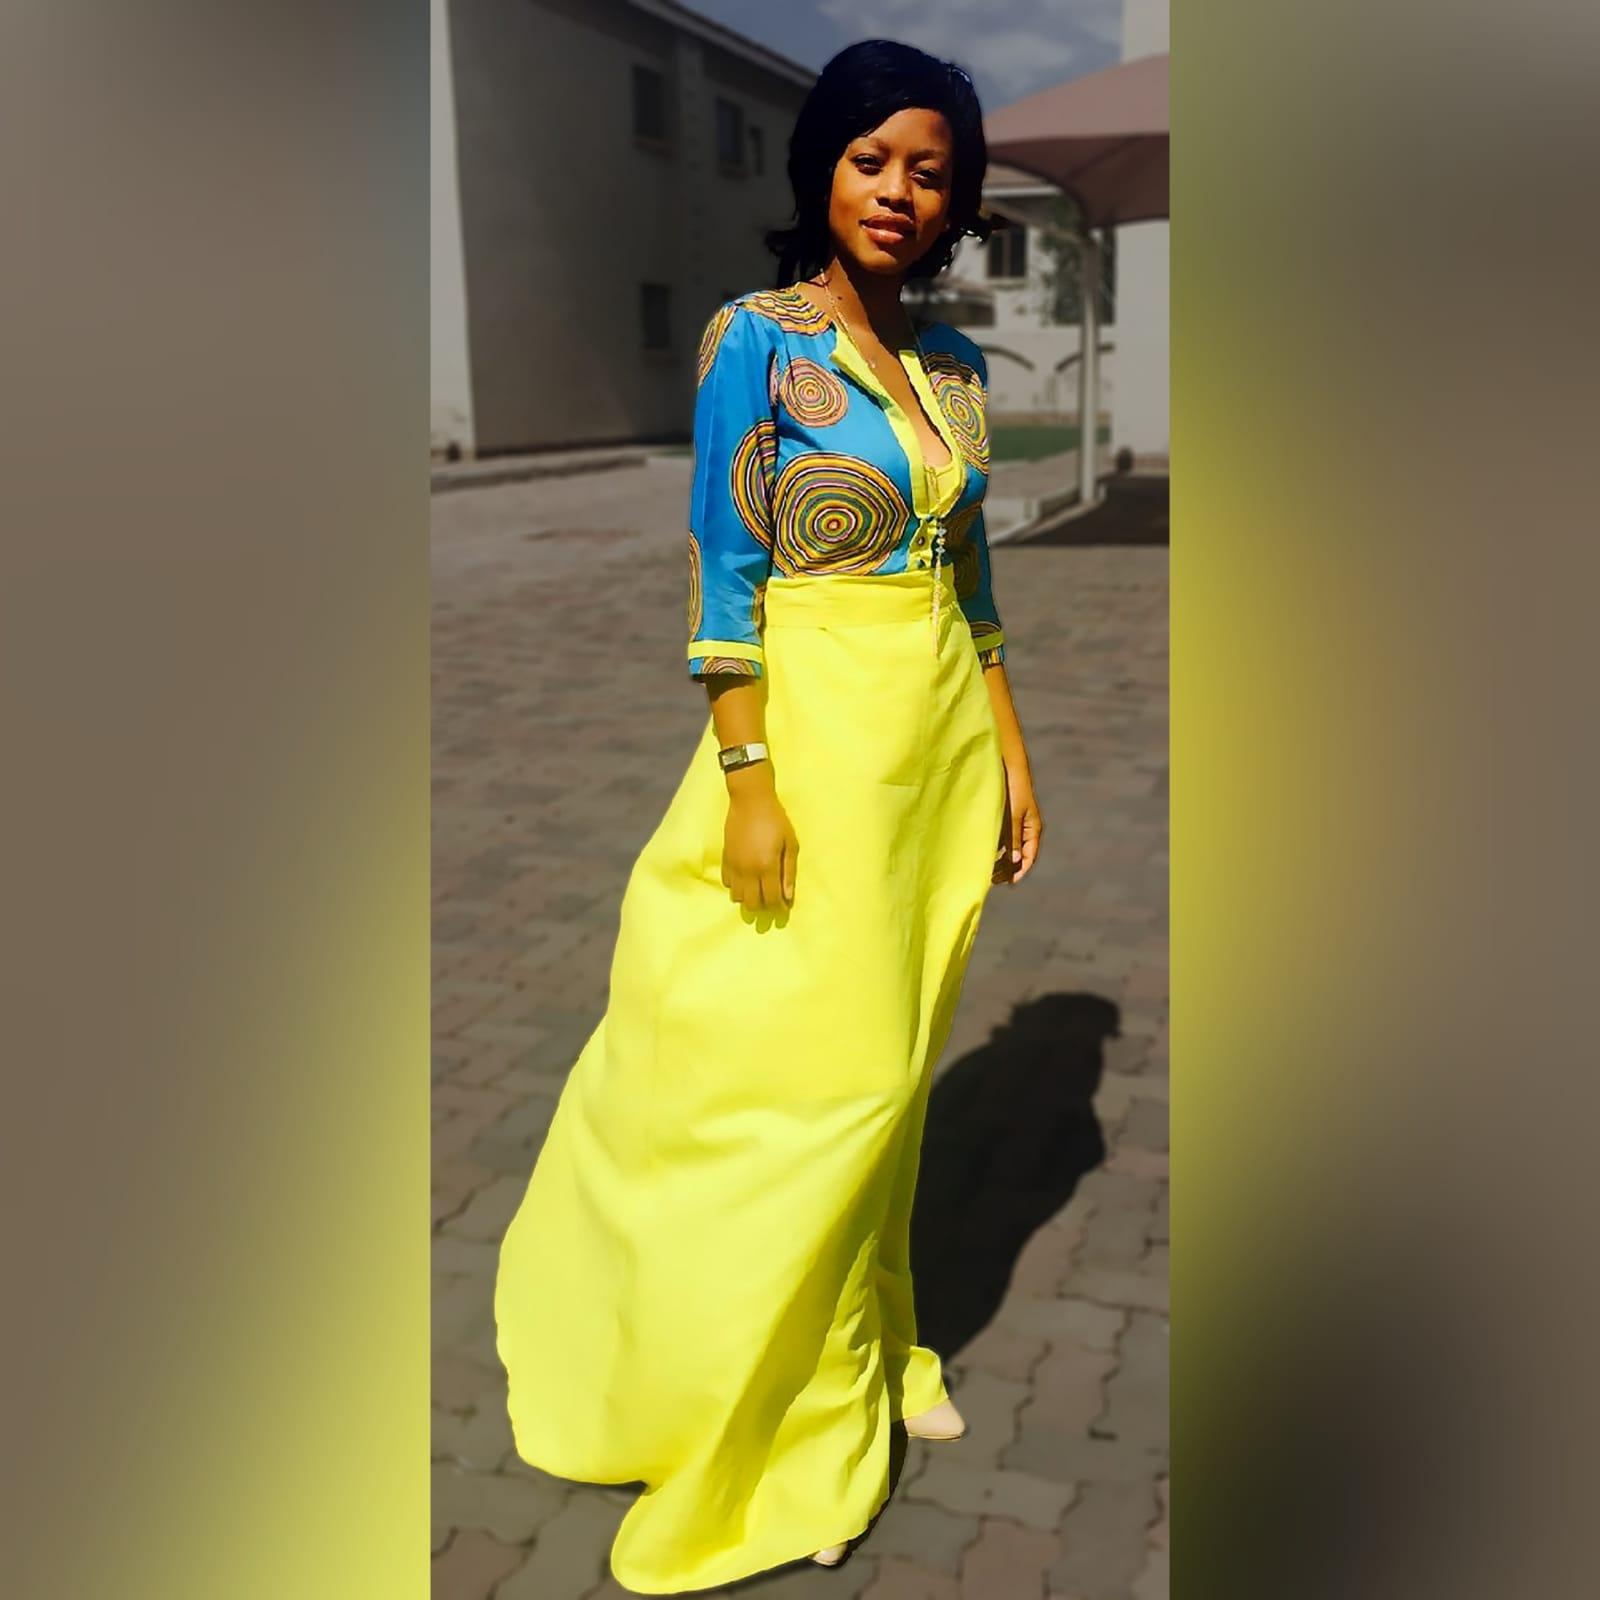 Blue & yellow modern traditional dress 1 modern traditional blue and yellow empire fit dress. Flowy bottom, neckline with a slit.